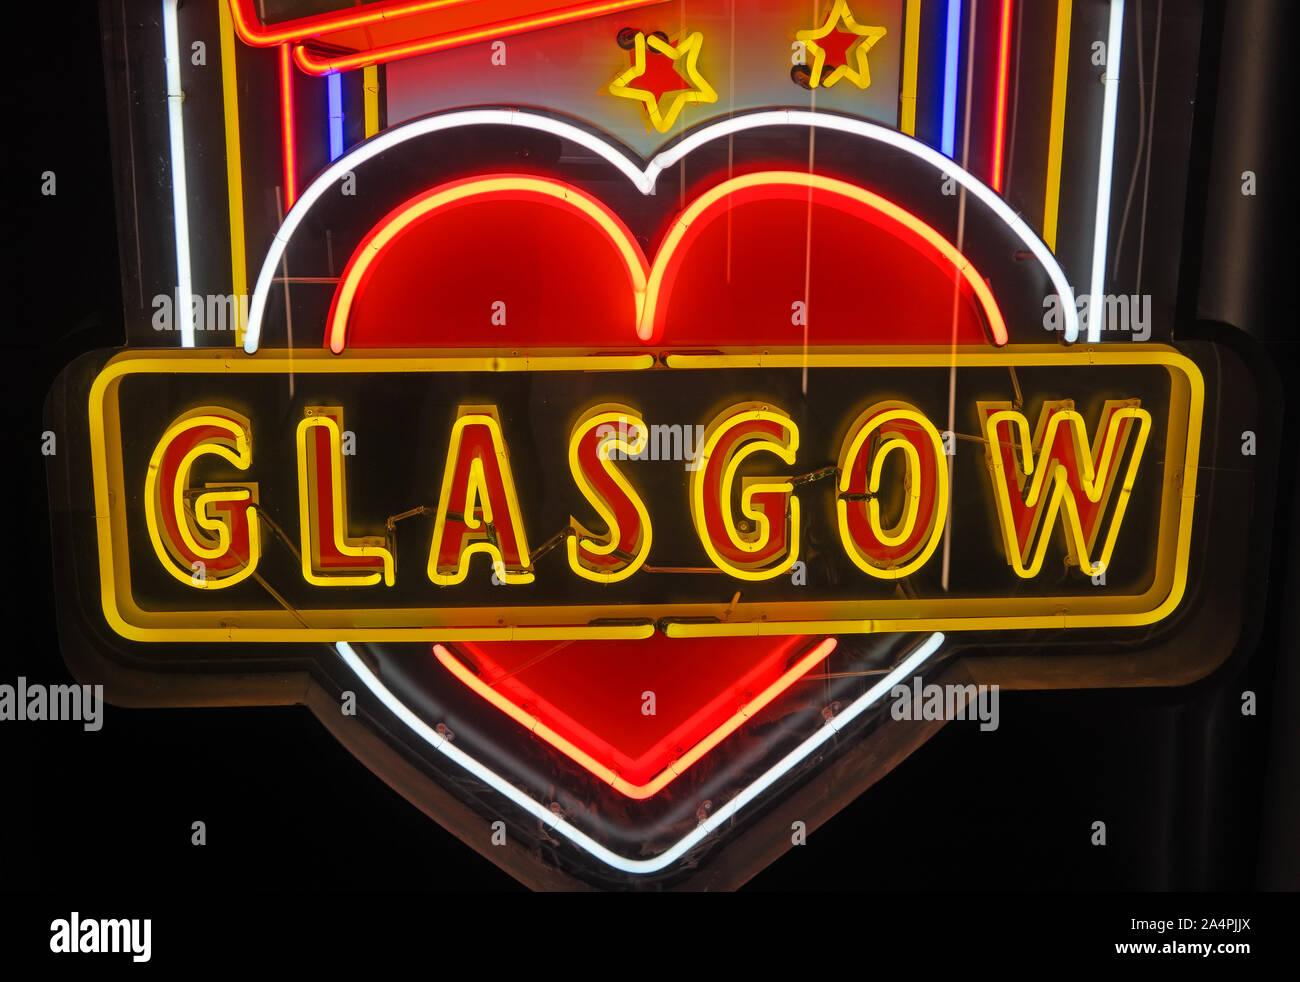 @HotpixUK,HotpixUK,Real Life,Glasgow,Love,Love Glasgow,love,We Love,neon,sign,shop,office,city,centre,UK,heart,GSofA,School of art,art,2017,Sinclair,Ross,Ross Sinclair artist,GSA,Neon Sculptural Installation,Neon Sculpture,red,yellow,red heart,Glasgow School Of Art,writer,musician,Scottish,Professor of Contemporary Art Practice,School of Fine Art,Real Life project,project,lighting,GoTonysmith